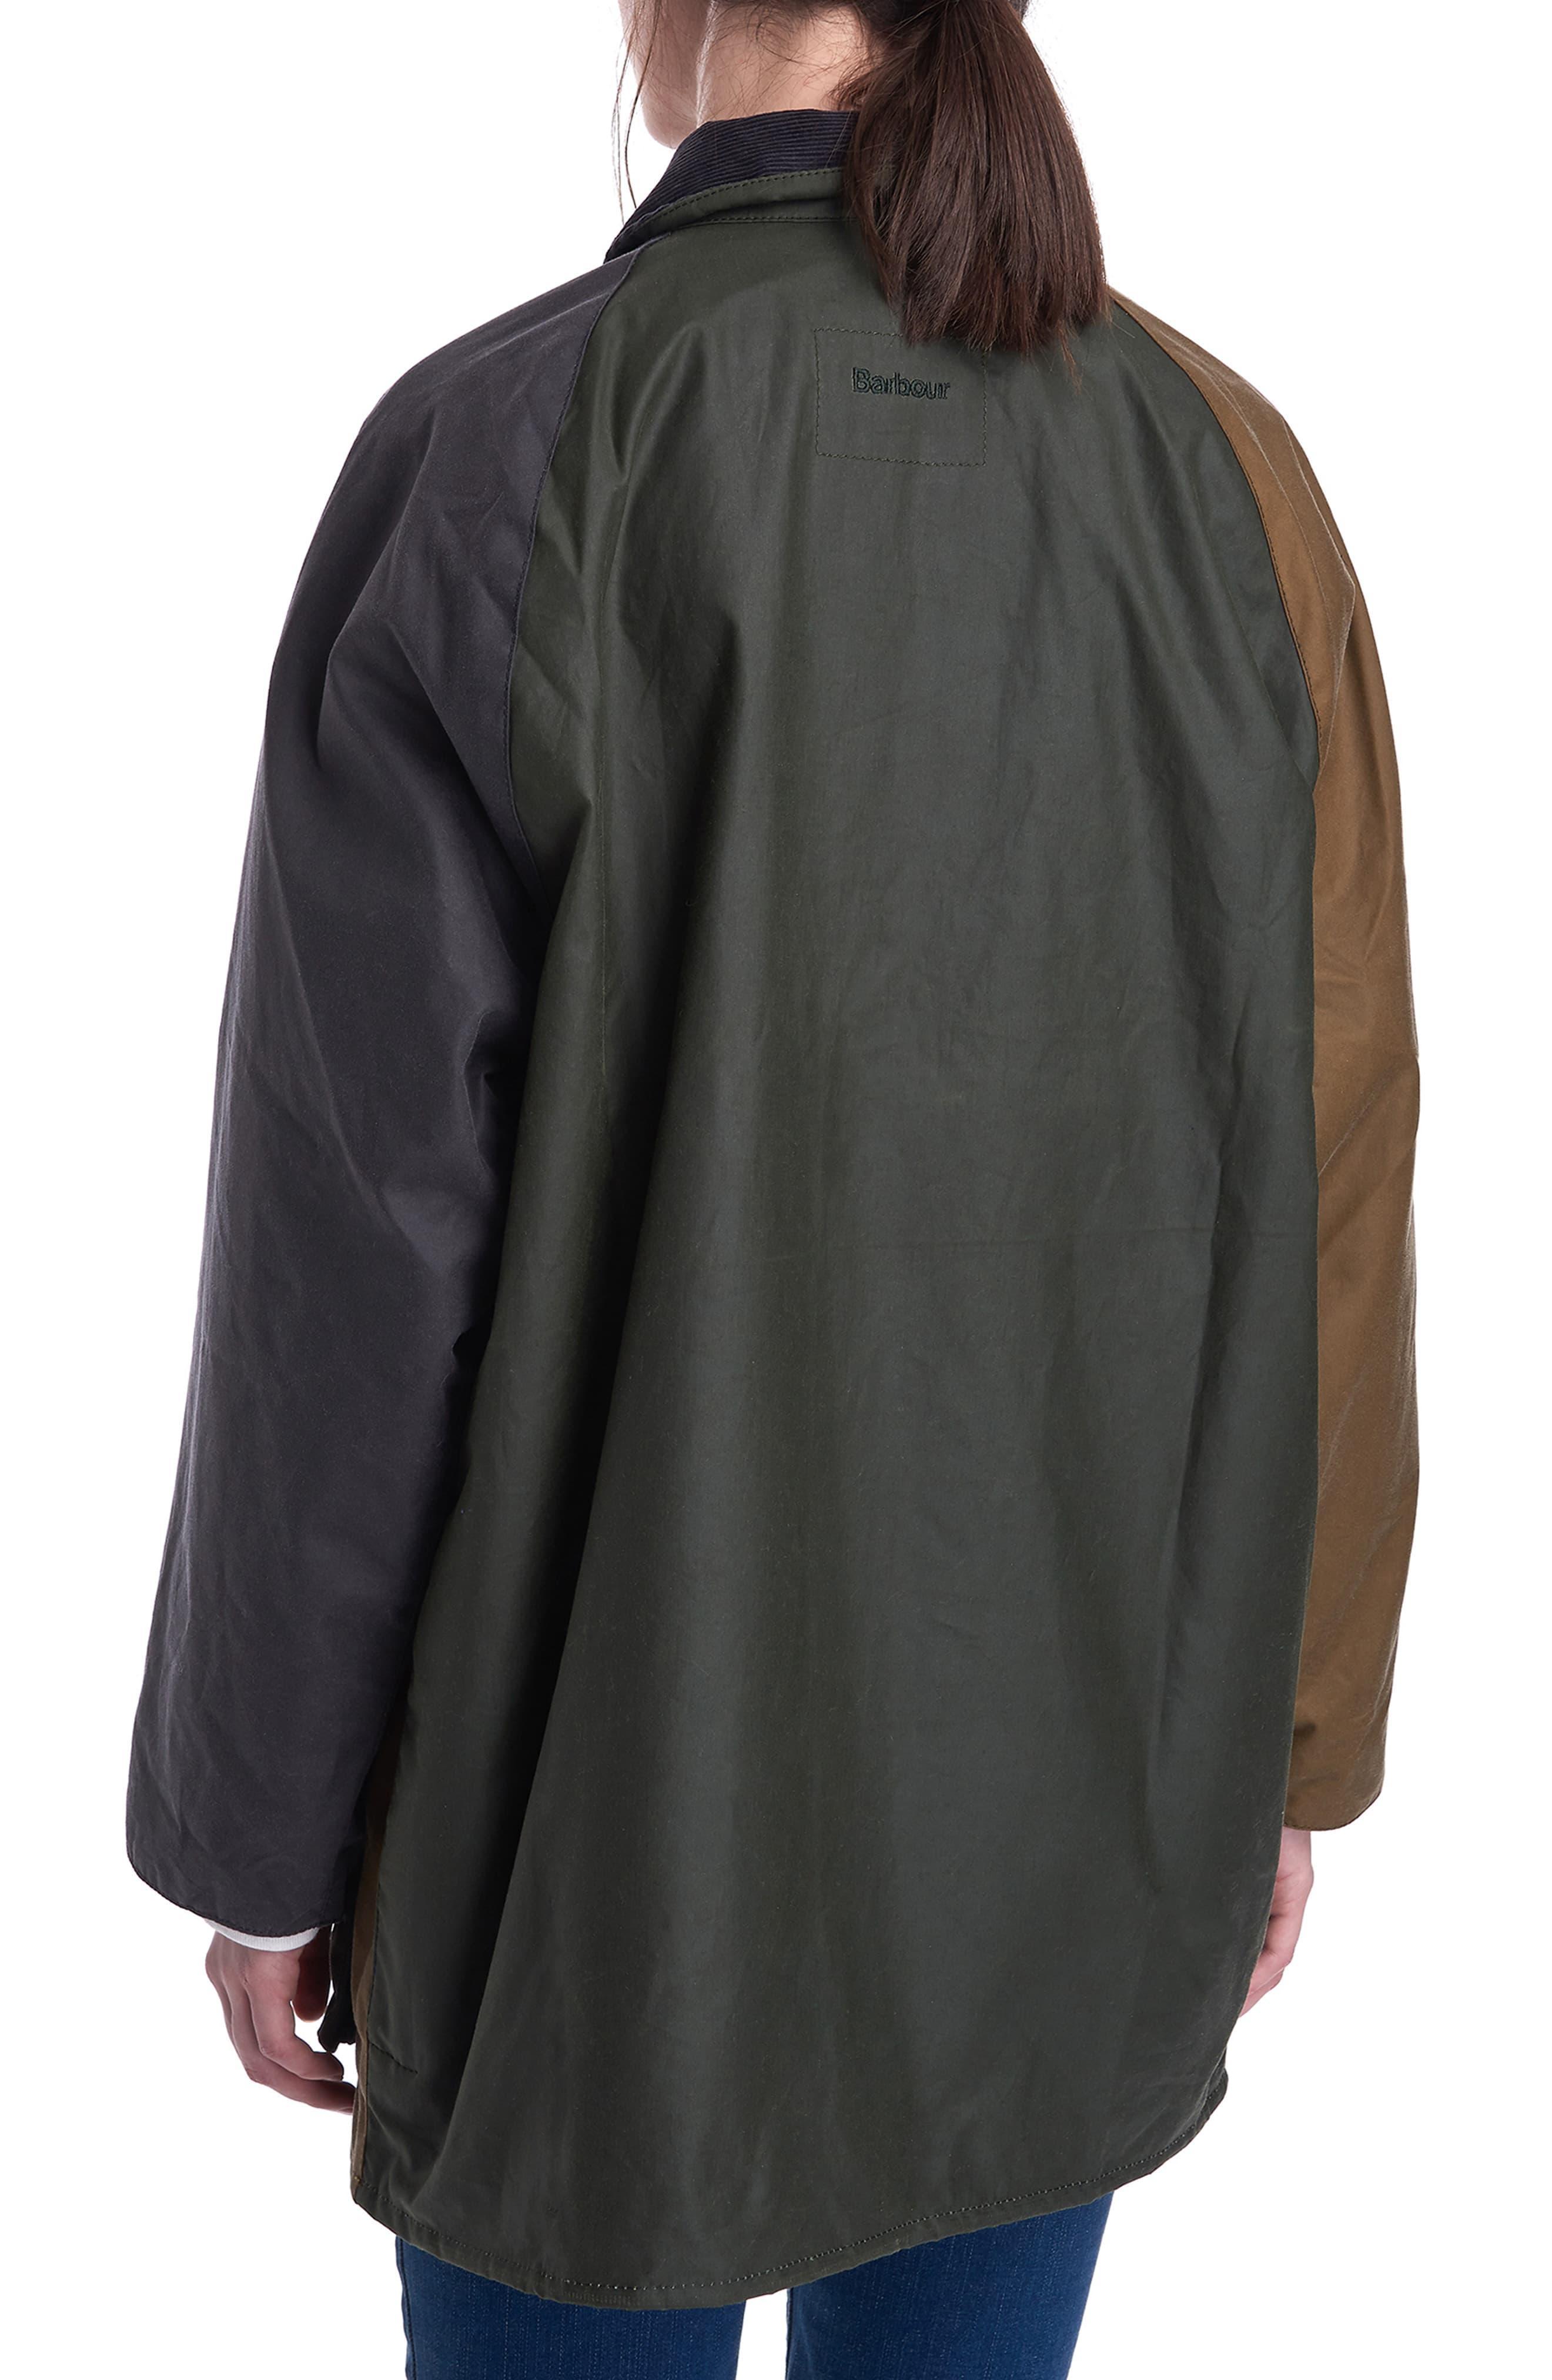 0f621b98f18a9 Barbour - Black X Alexa Chung Patch Weatherproof Waxed Cotton Jacket -  Lyst. View fullscreen